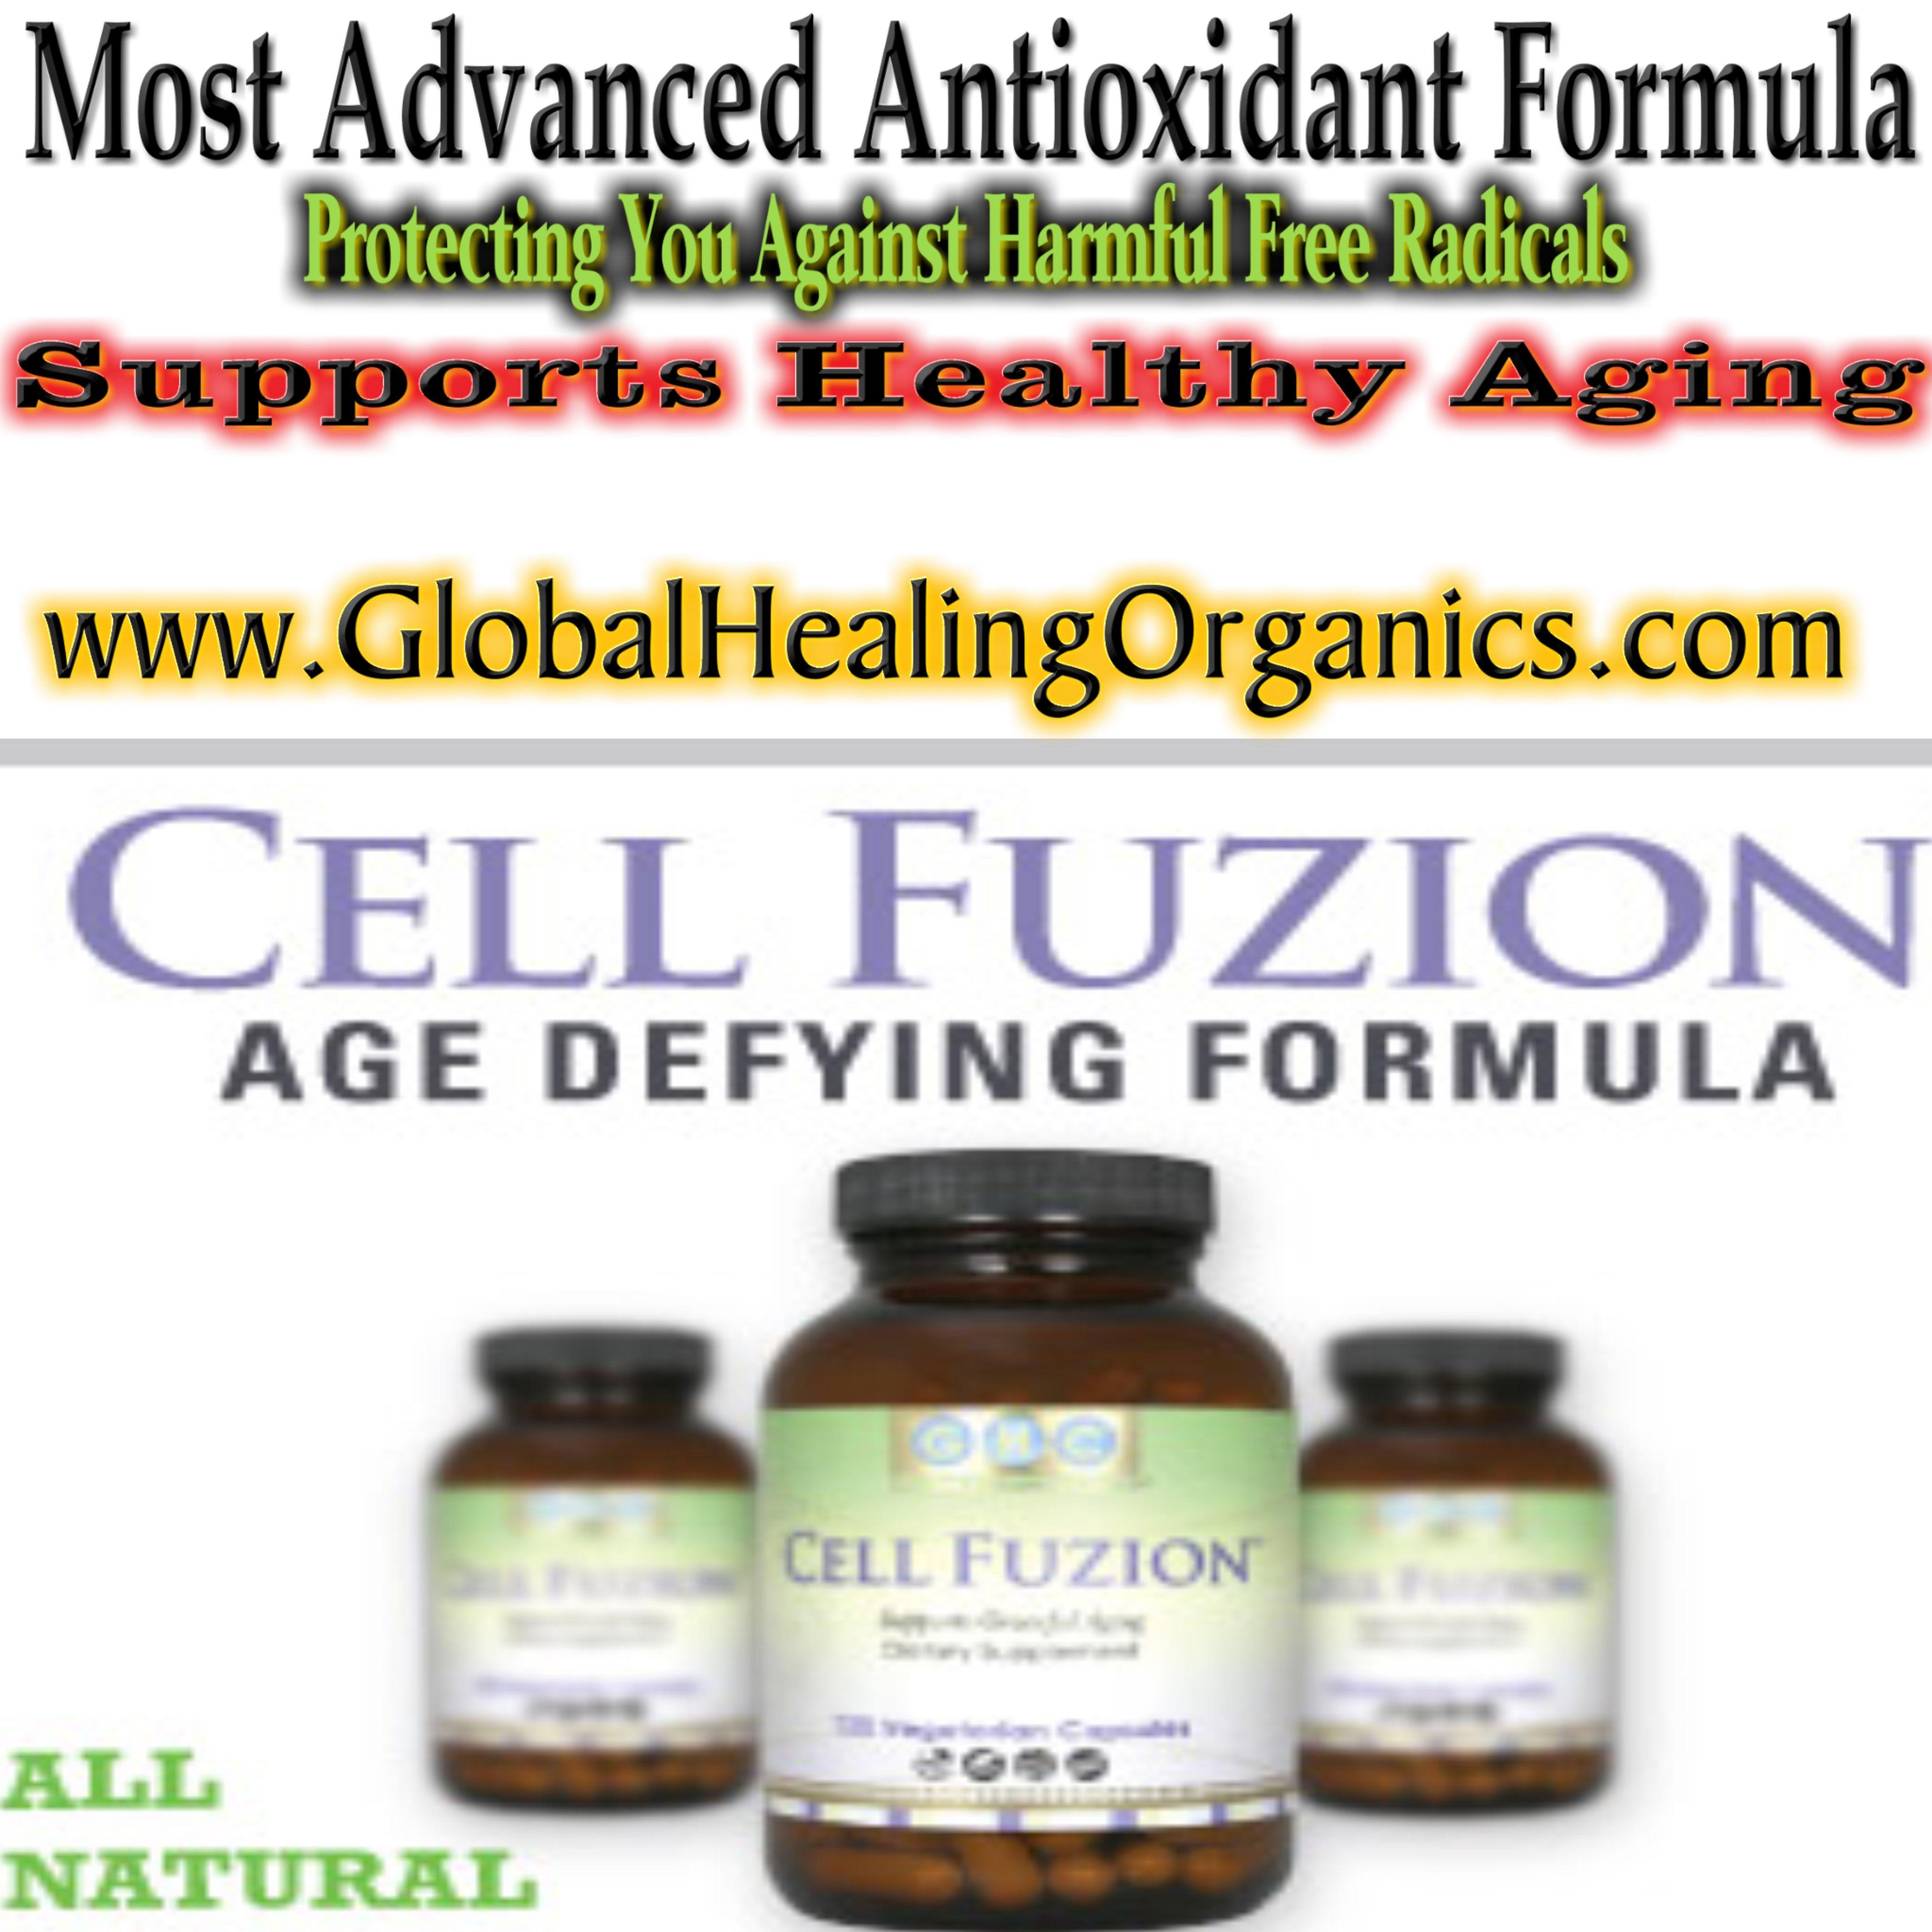 An advanced antioxidant formula designed to promote